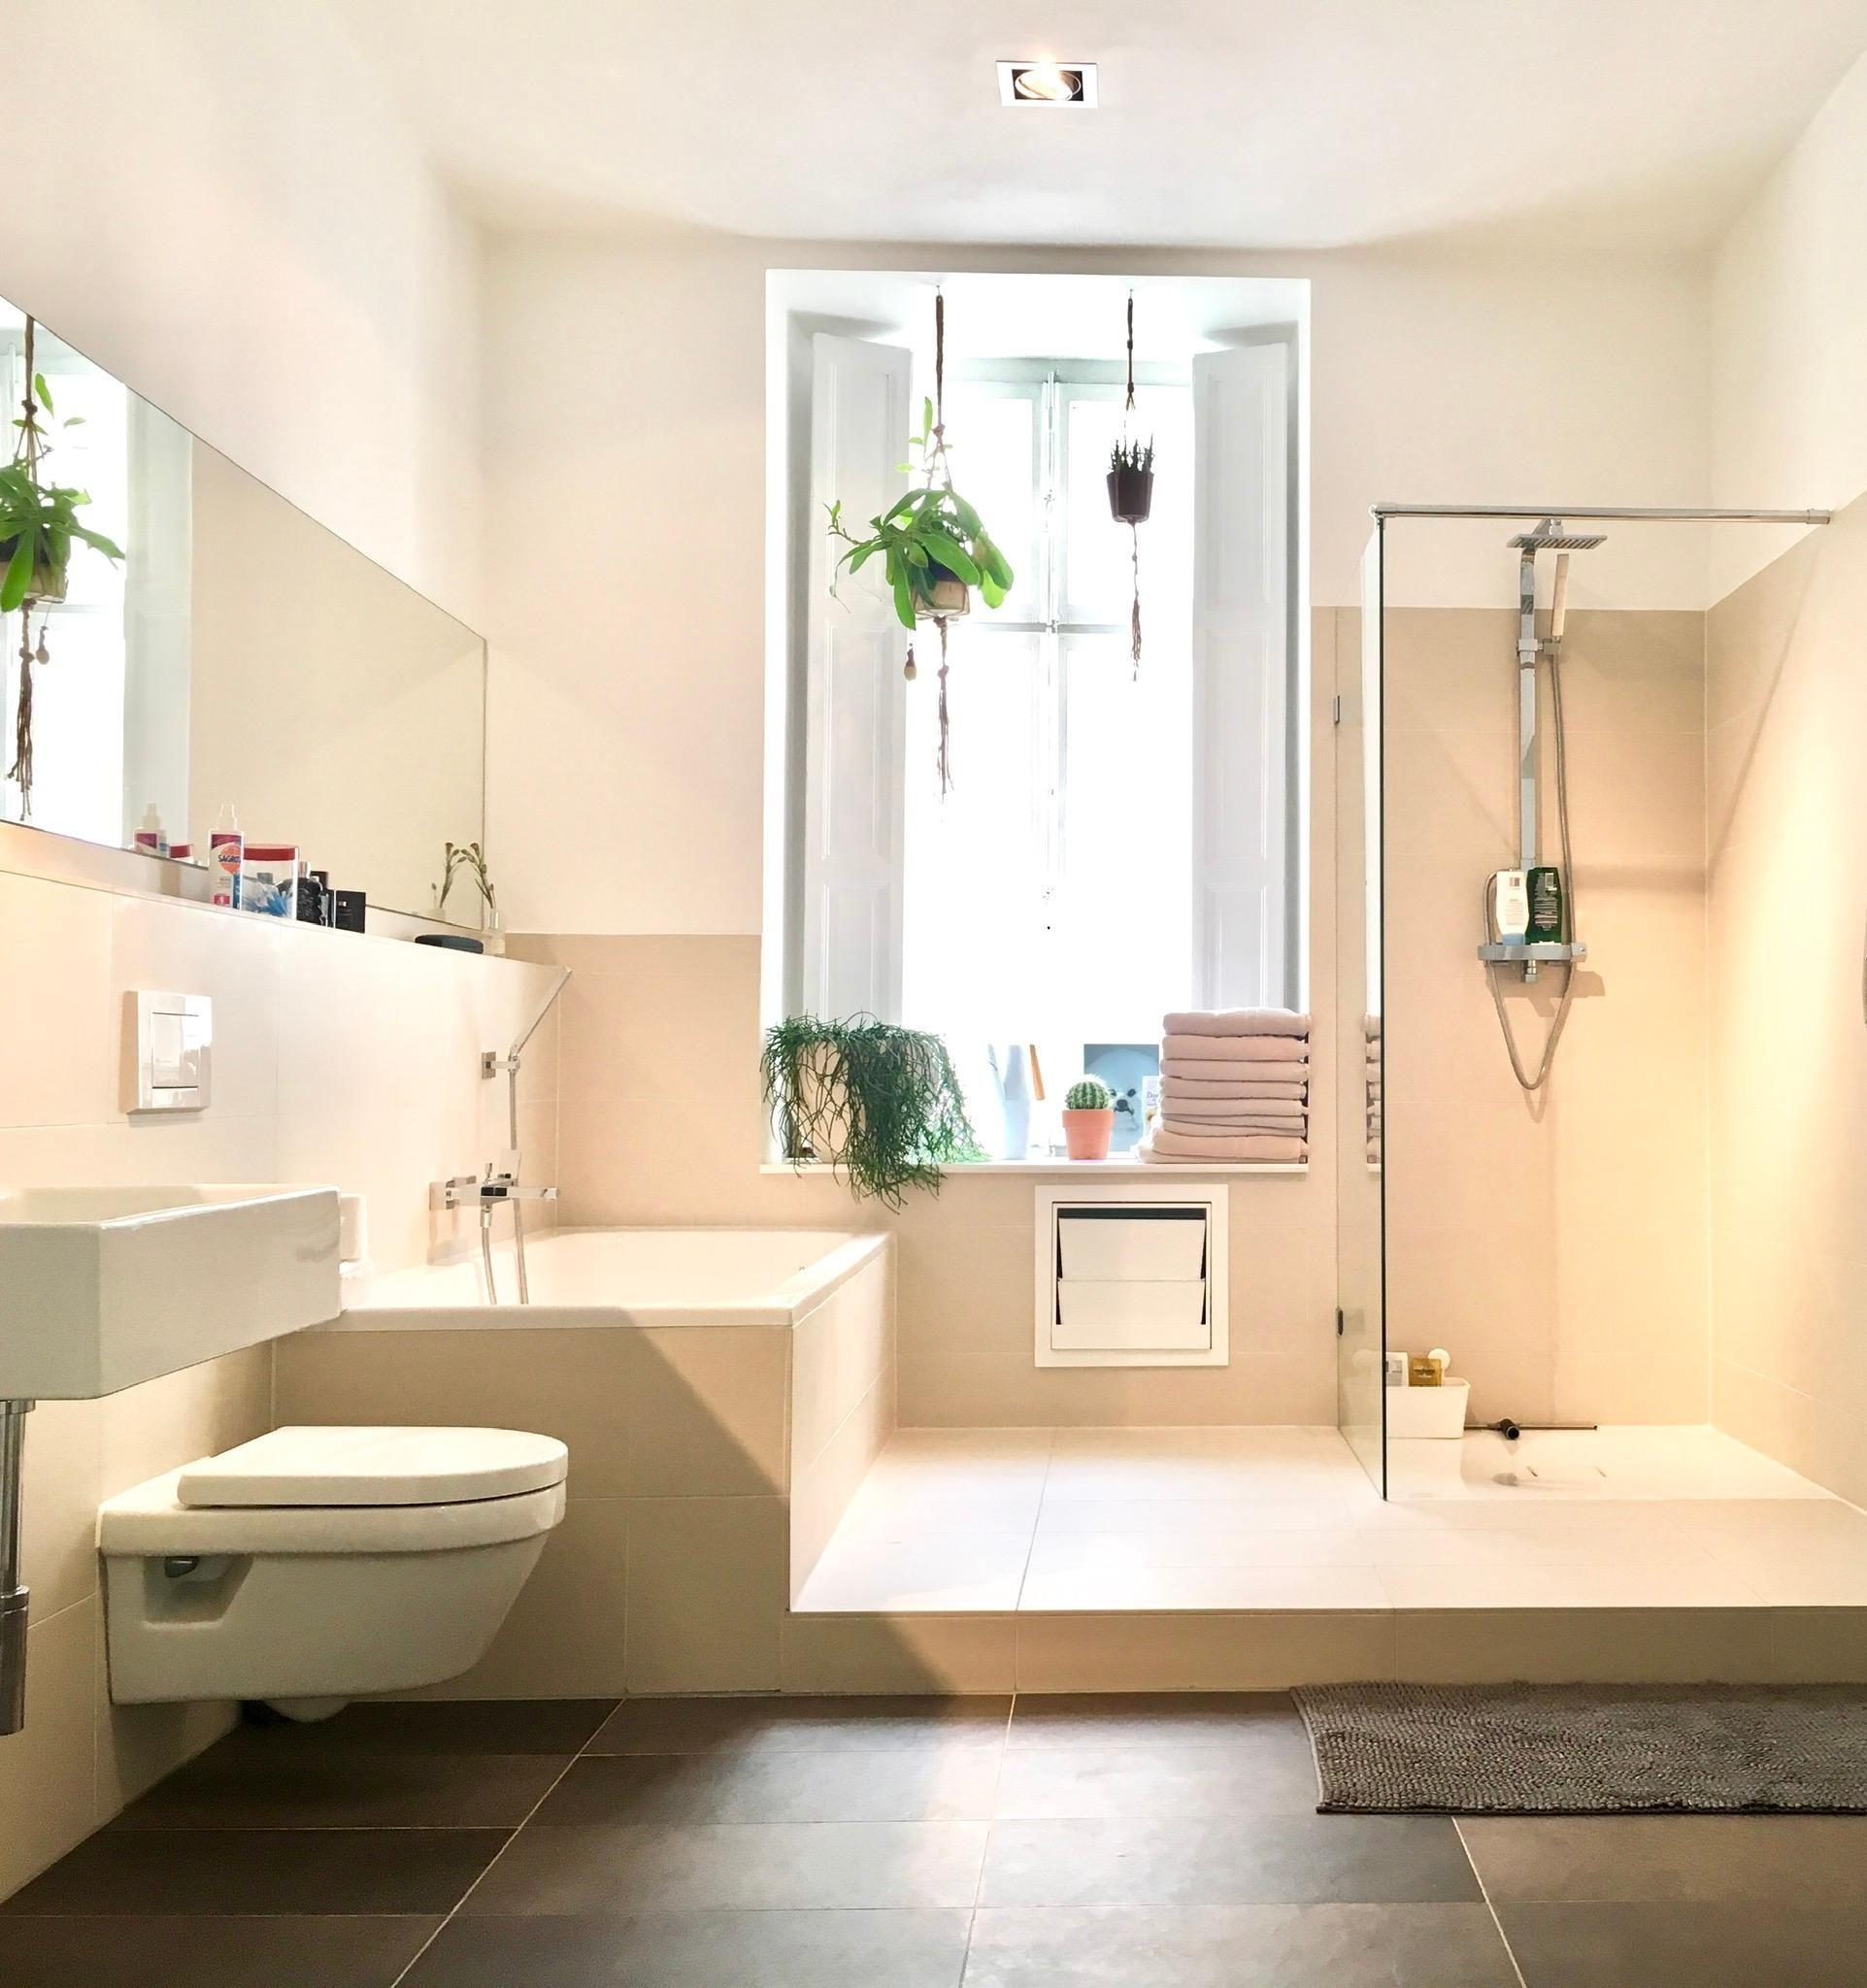 Badezimmer Badezimmer Badezimmerideen Und Baden